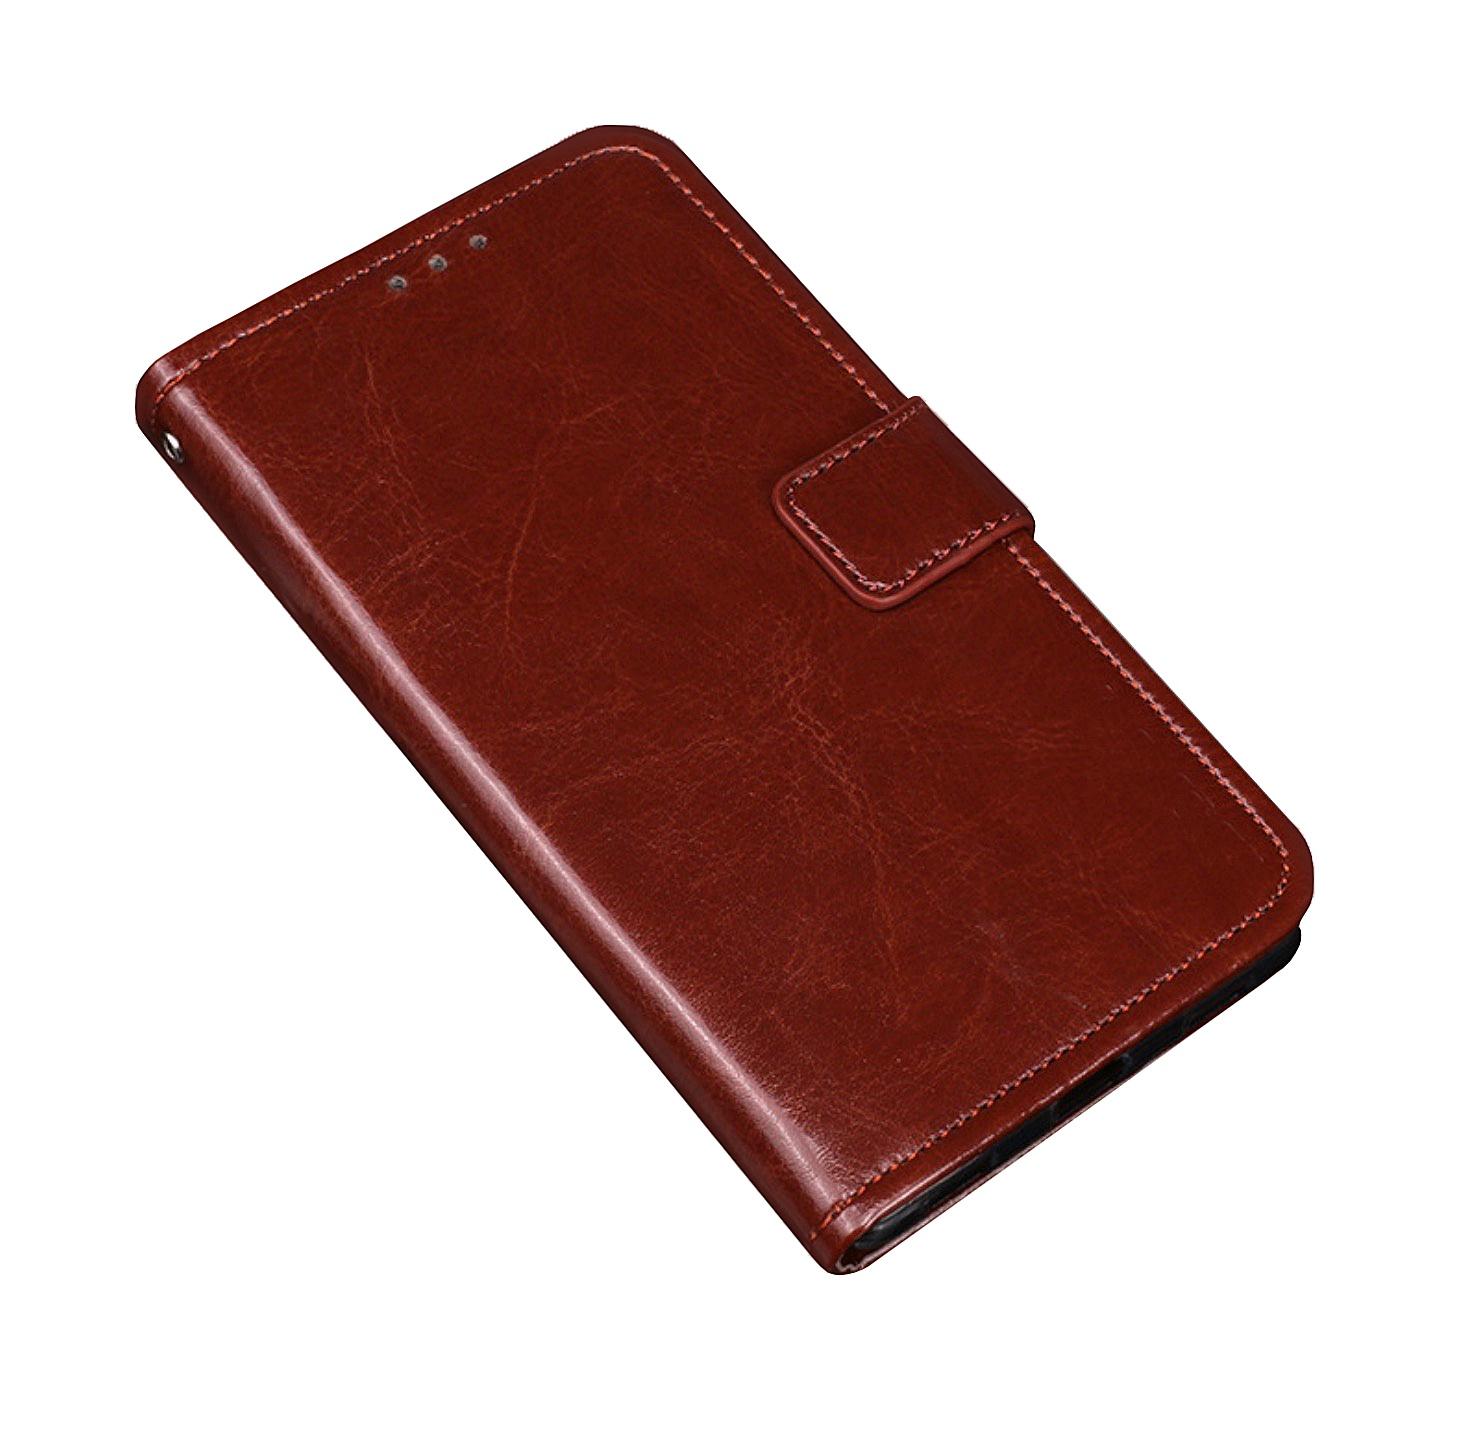 купить Чехол-книжка MyPads для ZTE Nubia M2 5.5 (NX551J) с мульти-подставкой застёжкой и визитницей коричневый онлайн